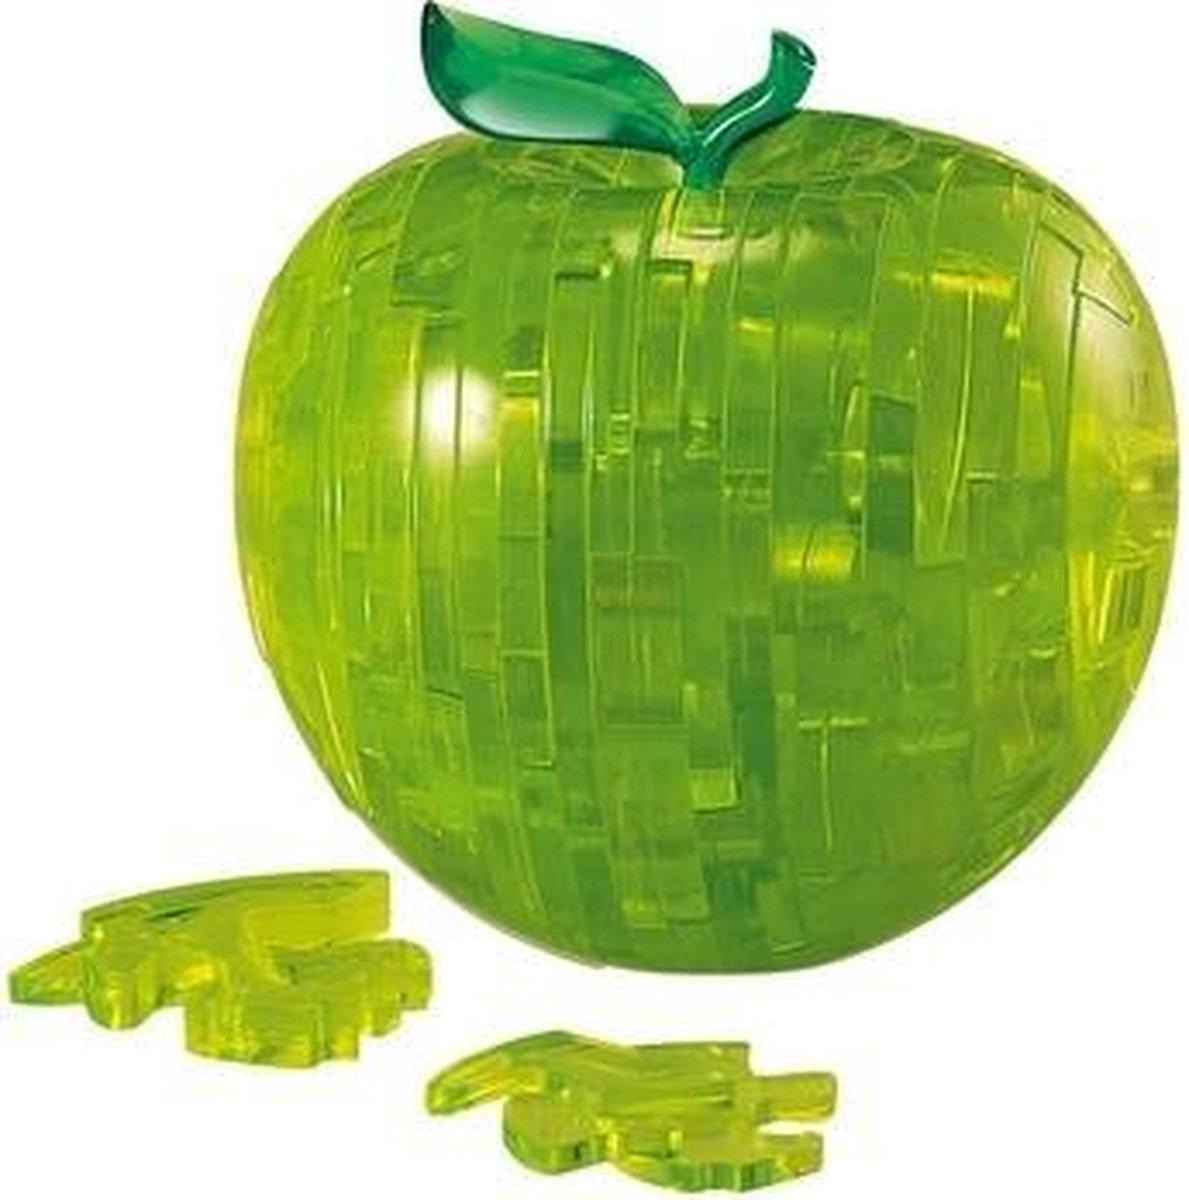 Kristallen 3D puzzel: Appel (44)